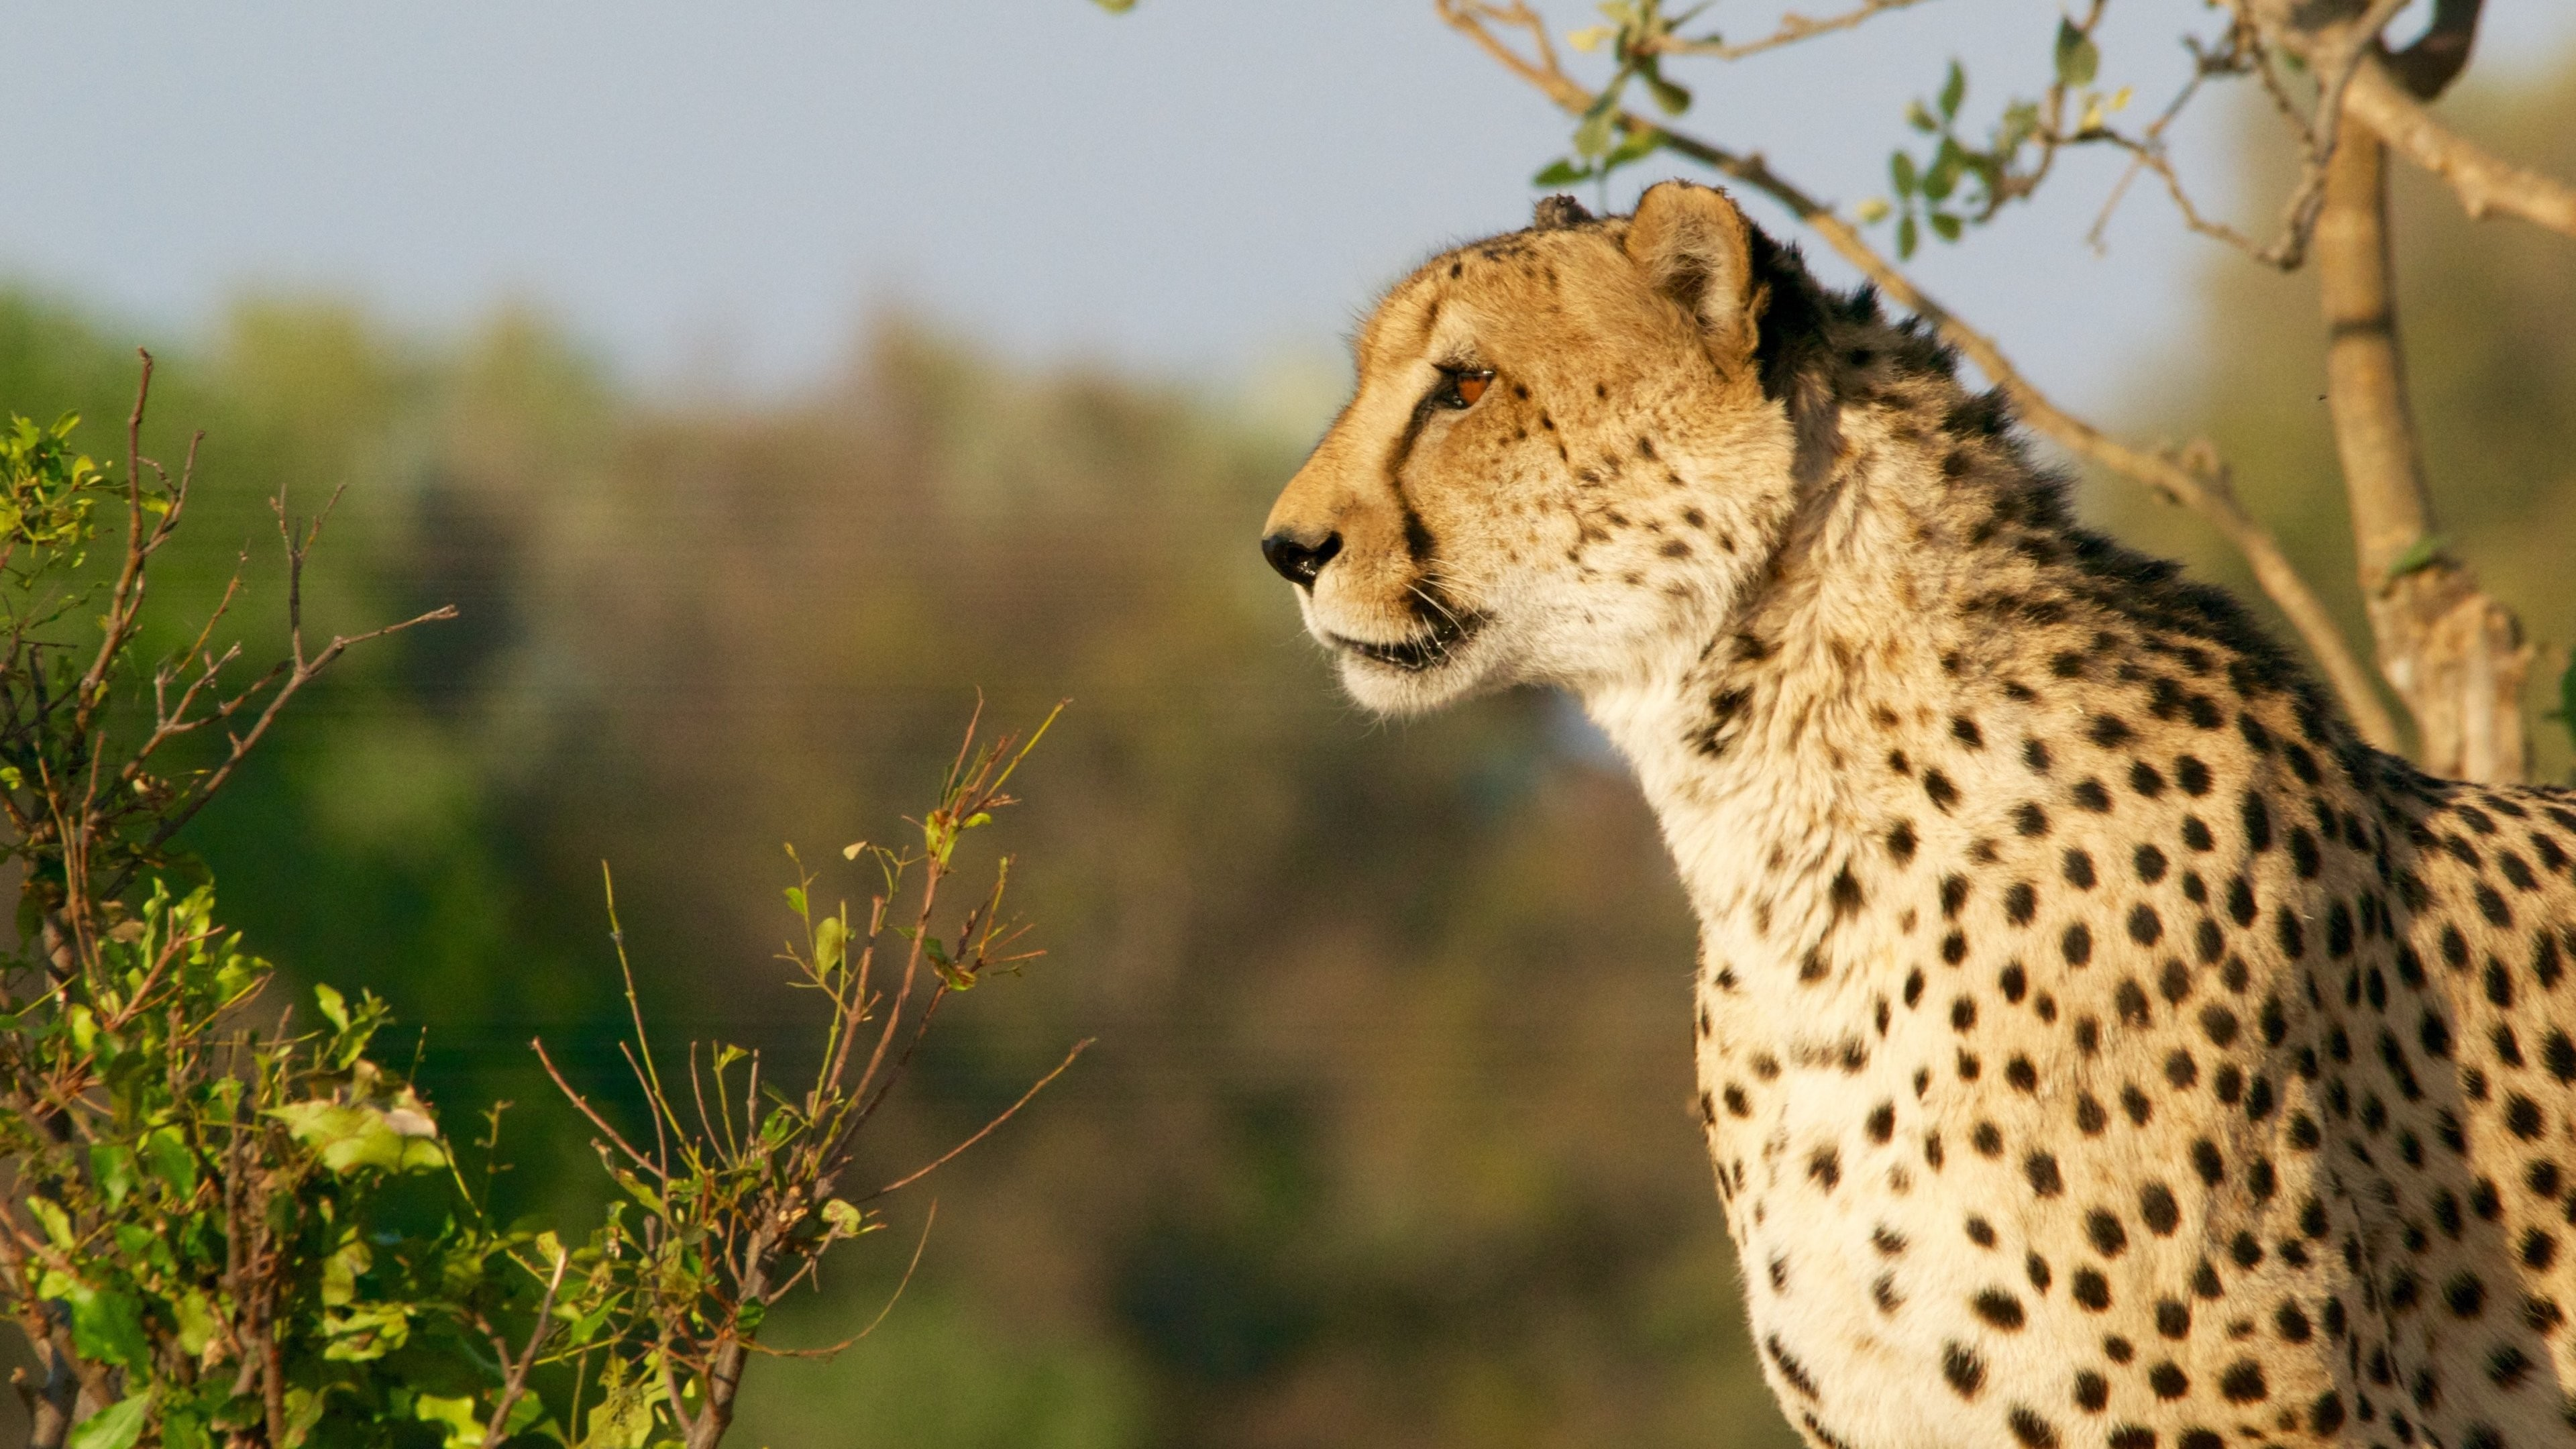 Beautiful Cheetah HD Wallpapers & Backgrounds - All HD